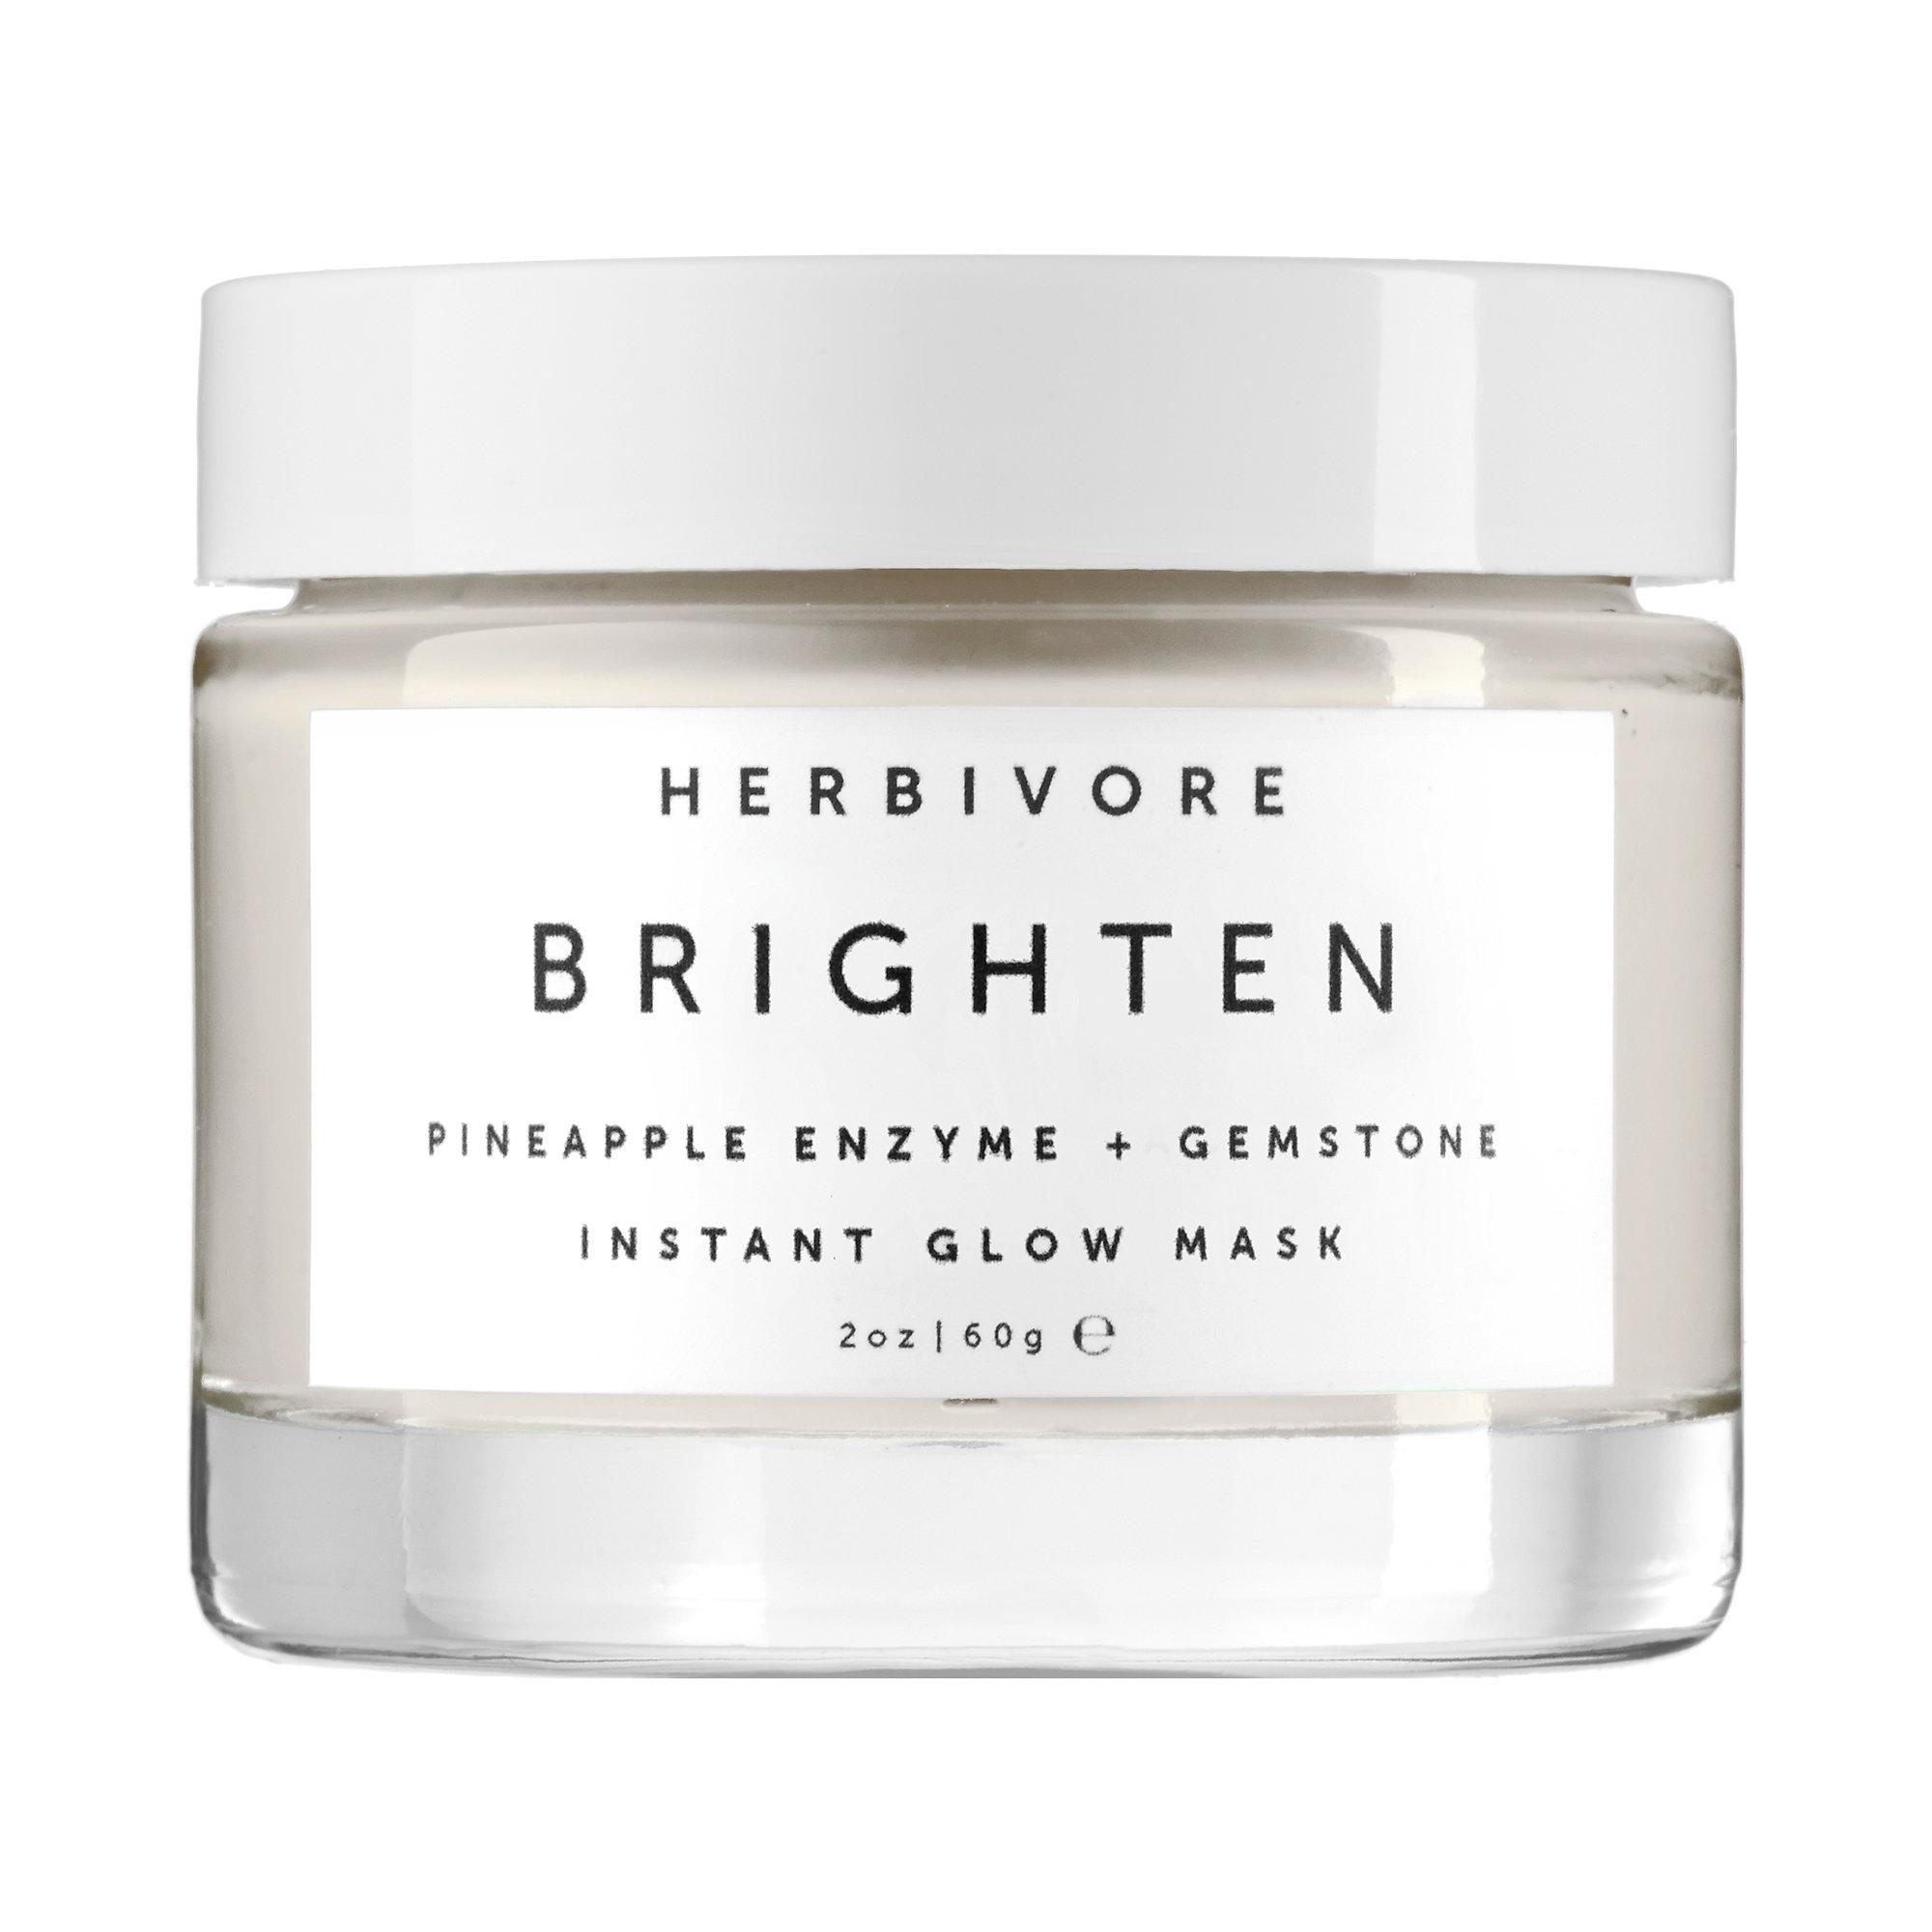 Herbivore   Brightening Pineapple Enzyme + Gemstone Instant Glow Mask